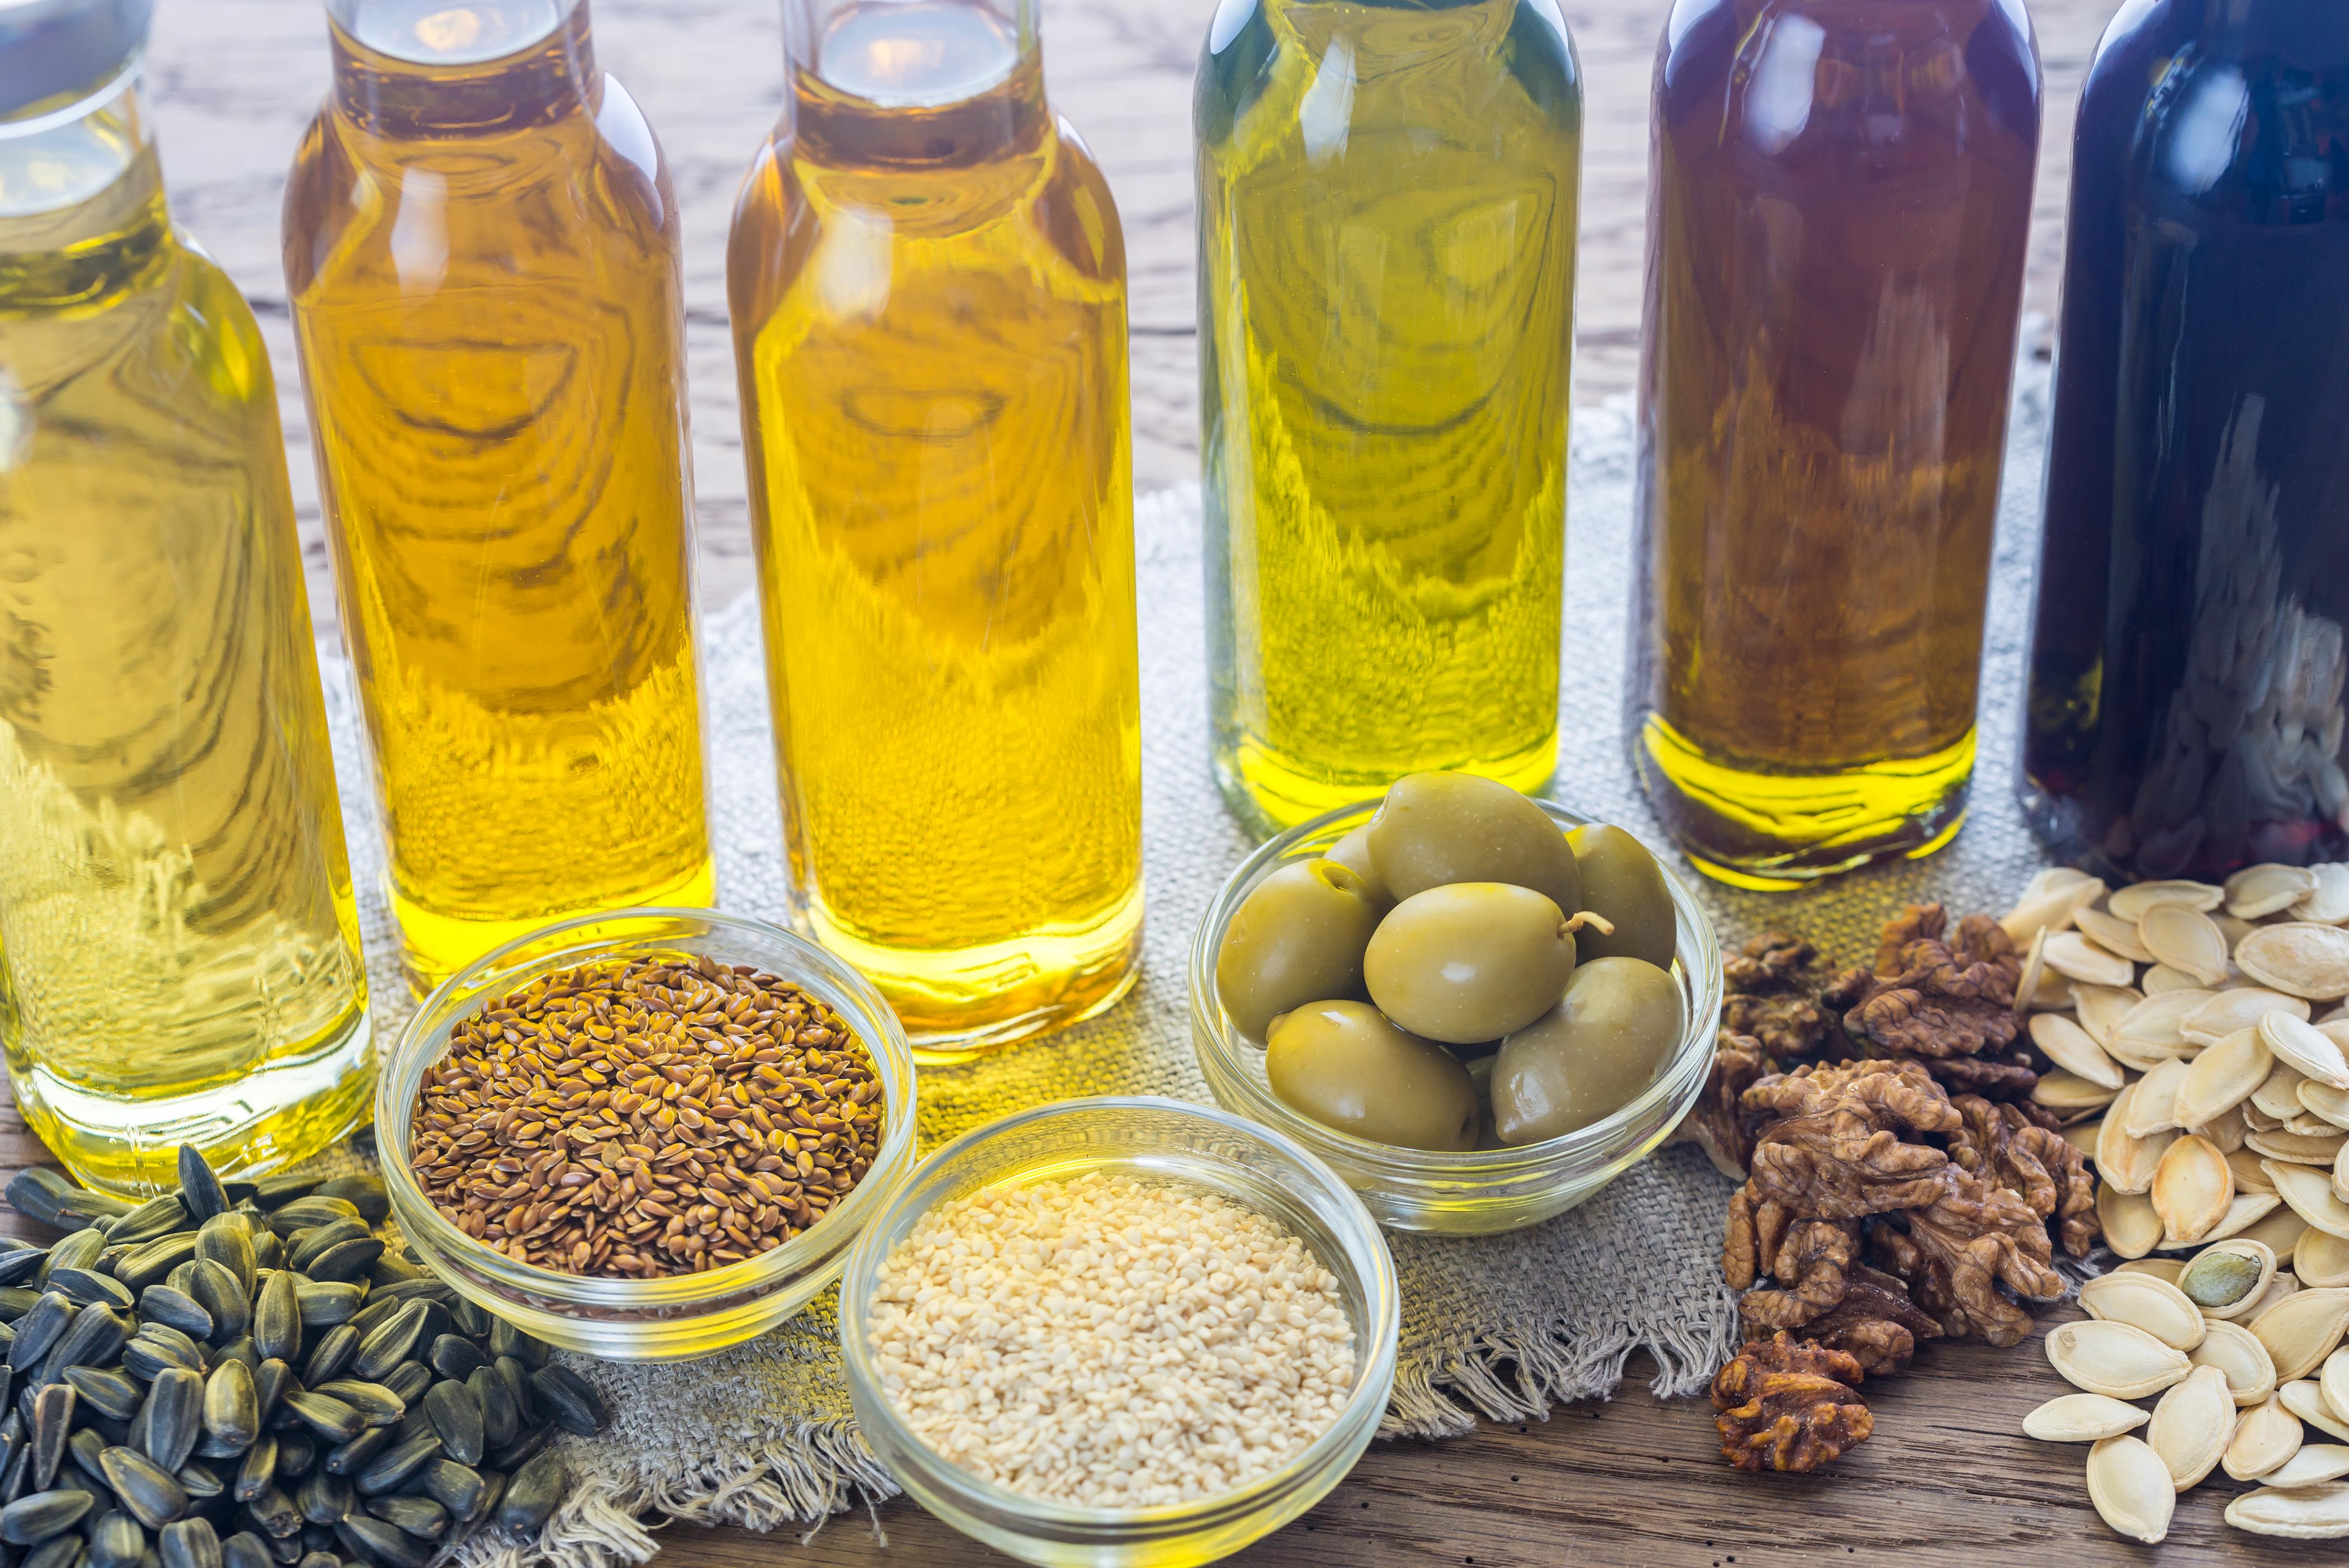 Tipi Di Olio Da Cucina In Bottiglia